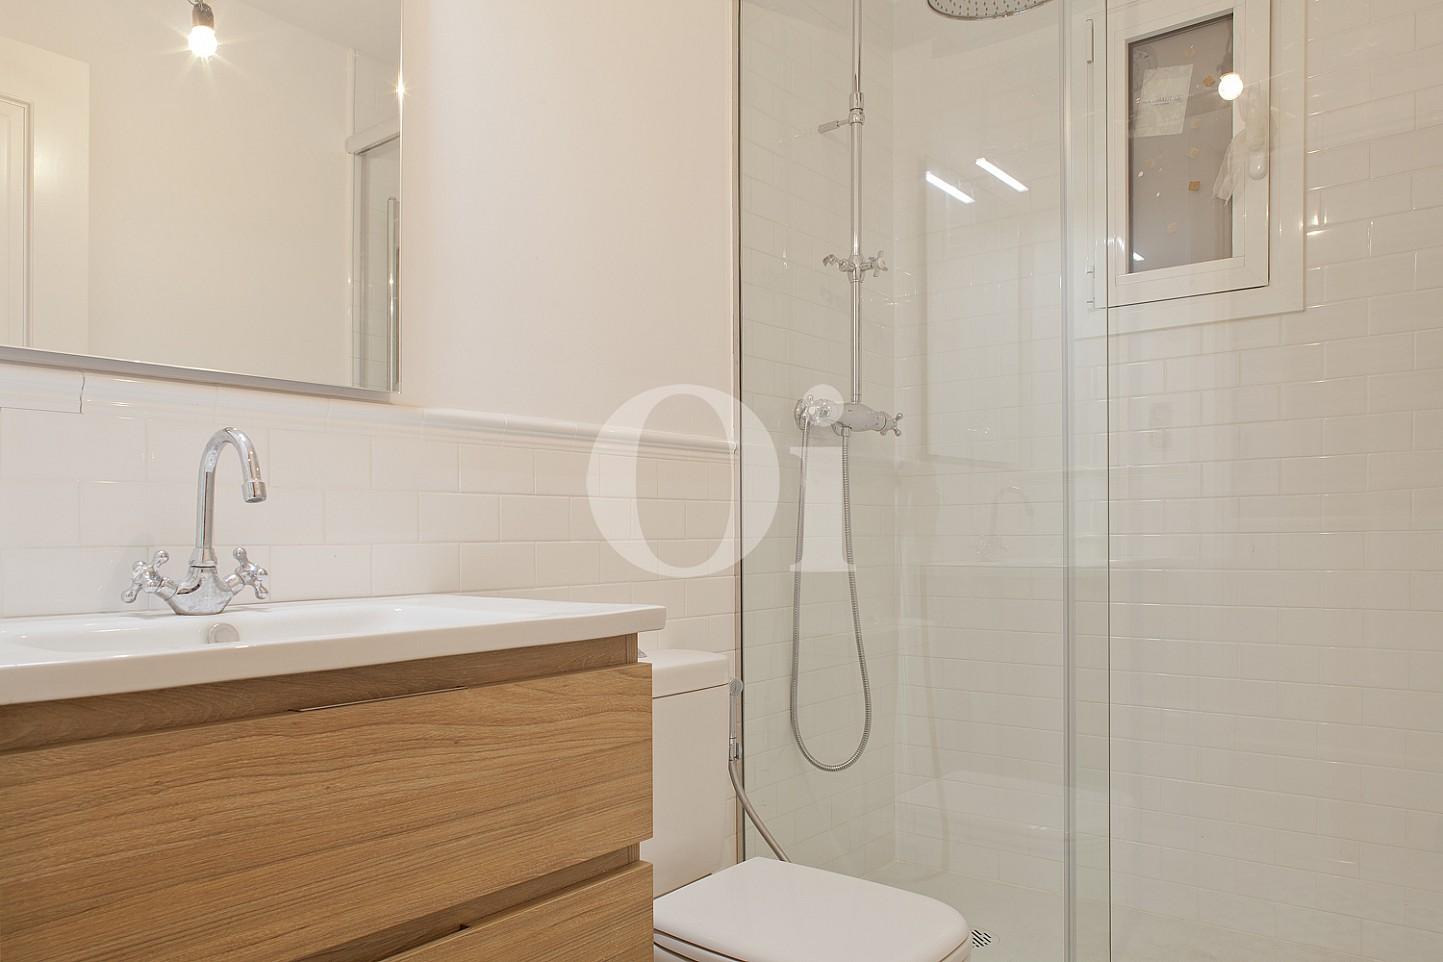 Ванная комната квартиры в Эшампле Дрета